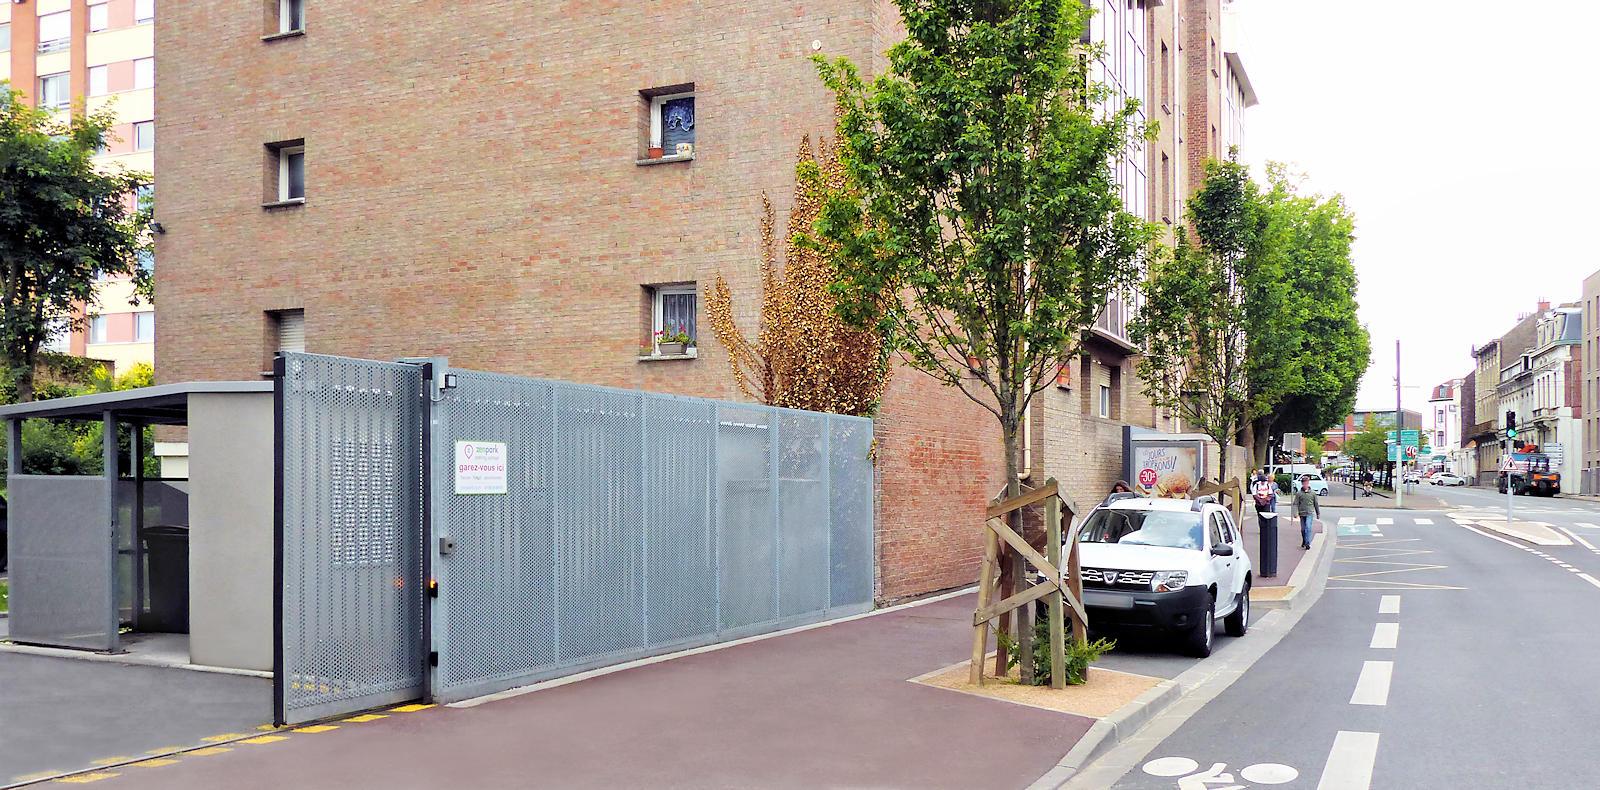 Rue Sasselange, Tourcoing - Parking zenpark Victoire